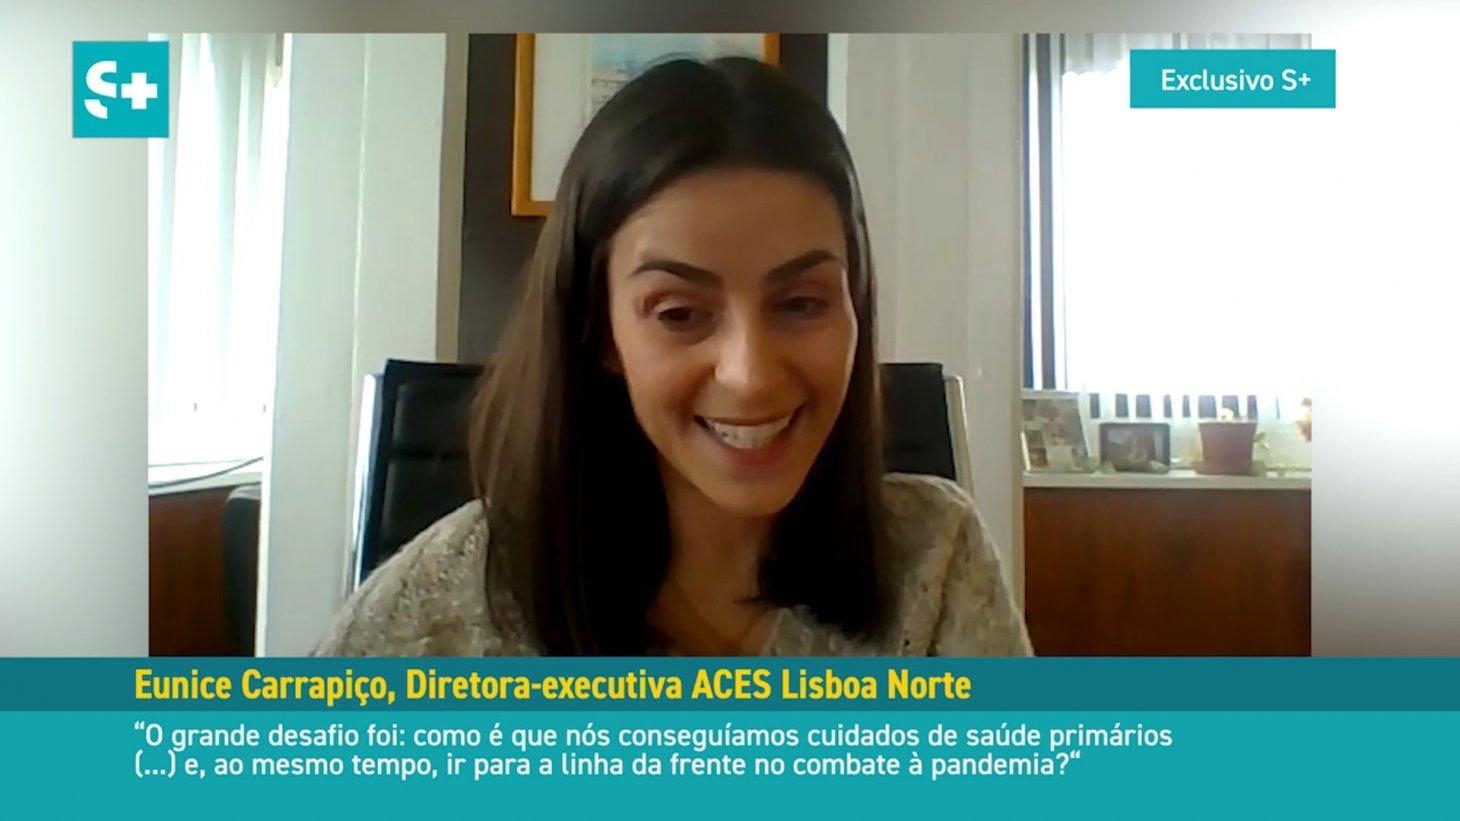 Eunice Carrapiço, diretora-executiva ACES Lisboa Norte #01